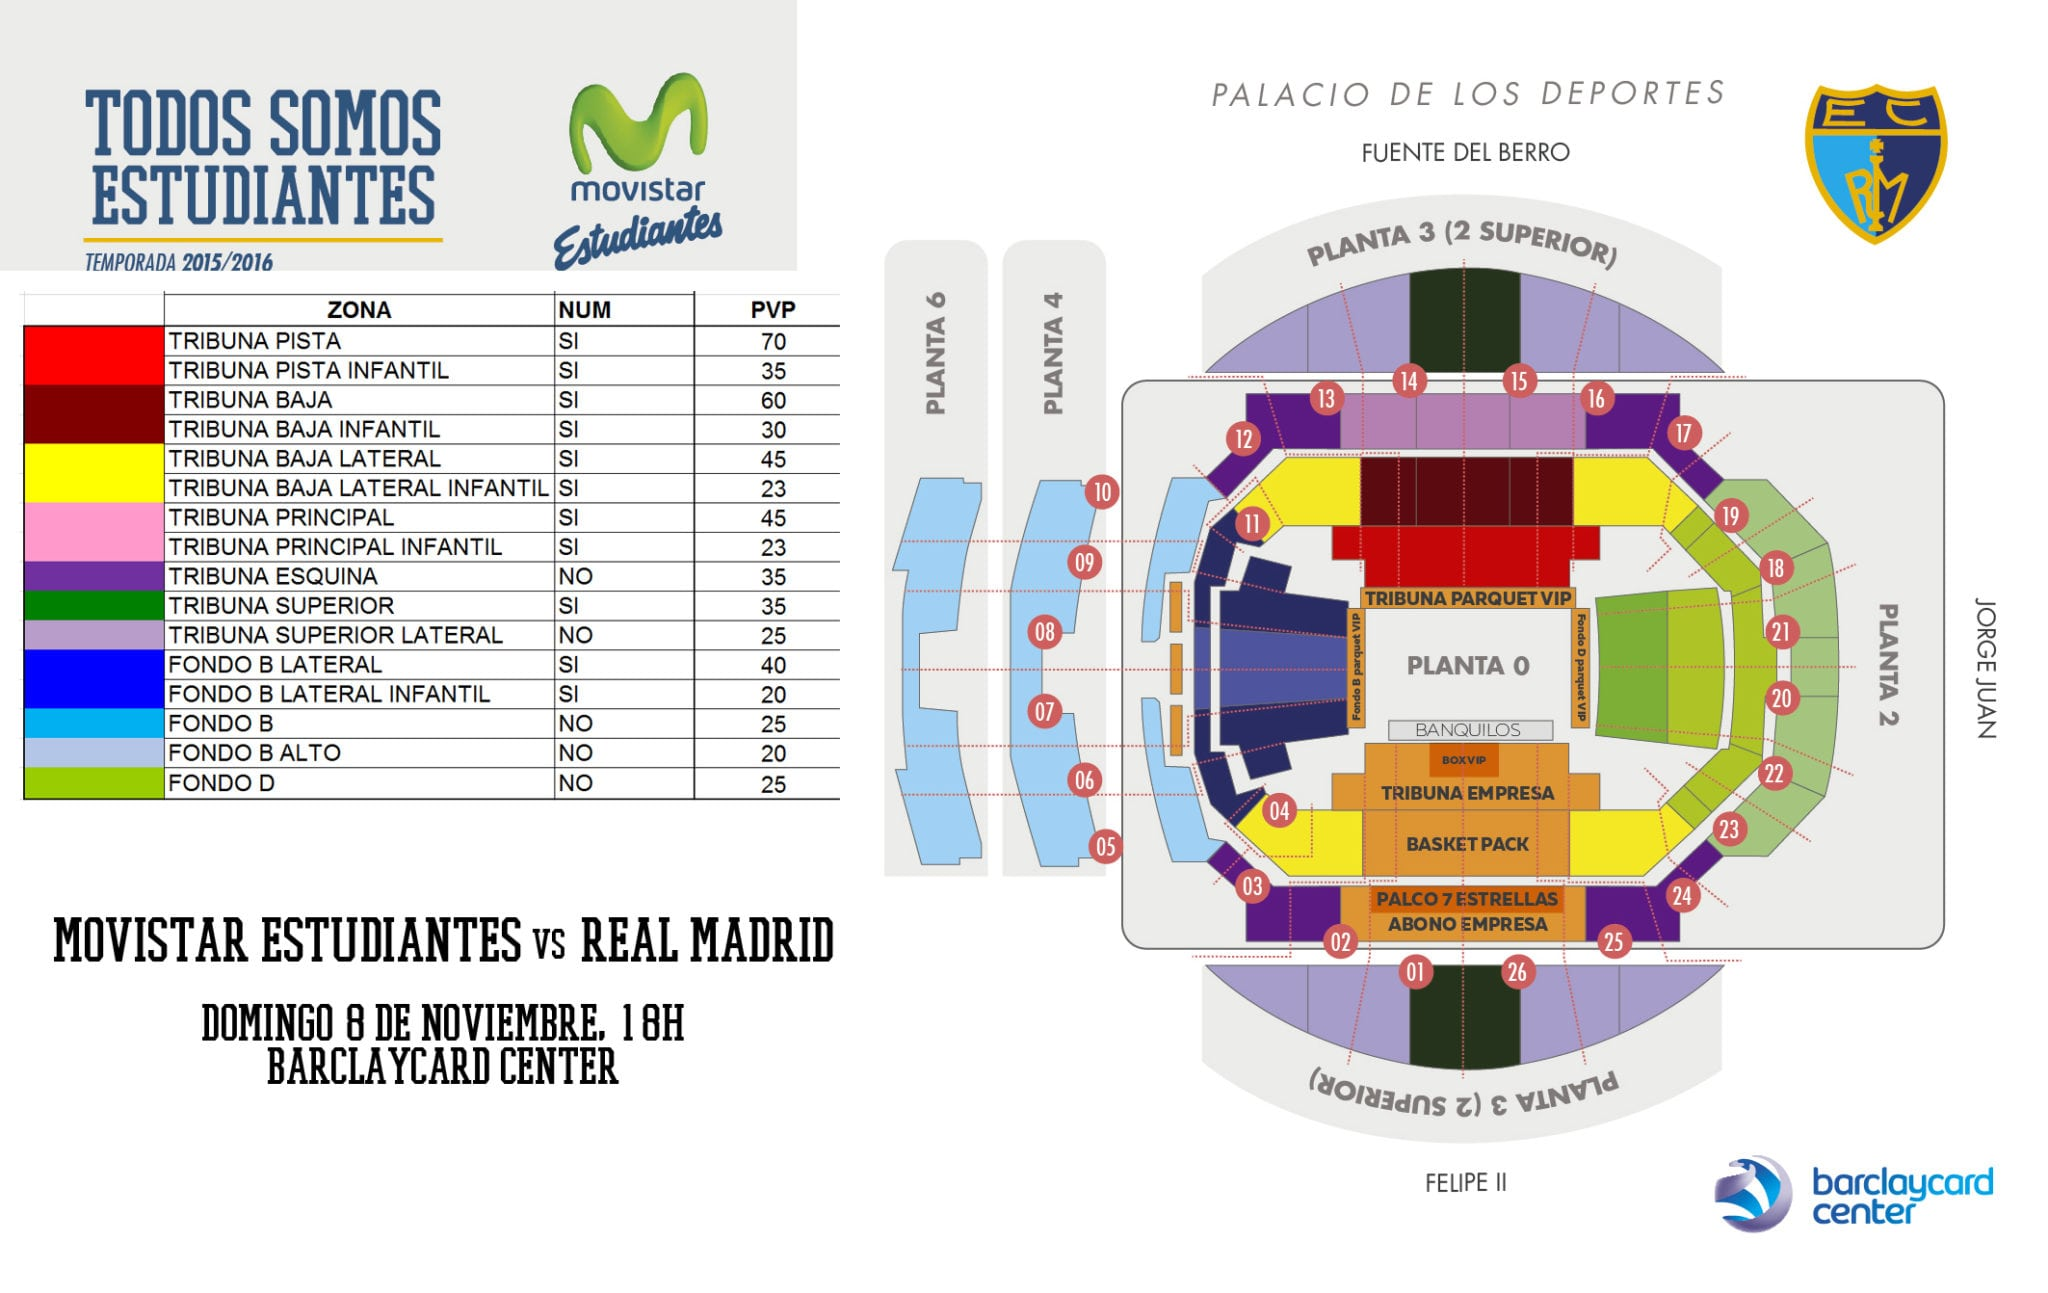 Entradas vs Real Madrid: de 20 a 70 euros